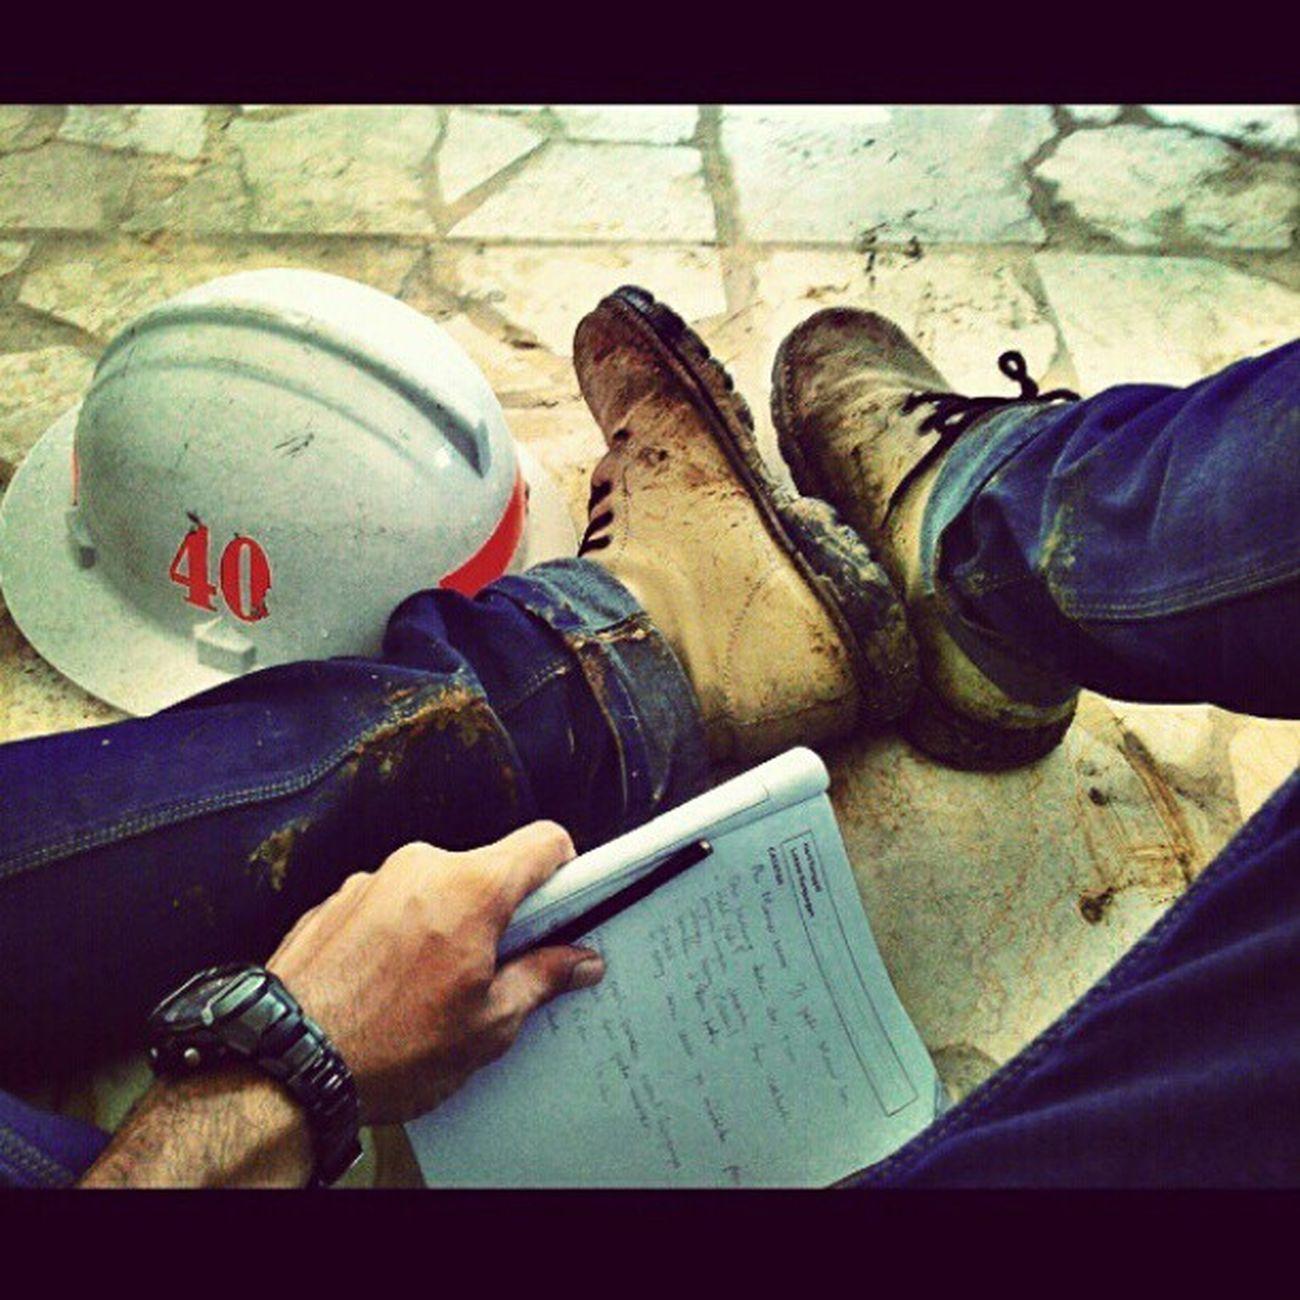 Ekskursi PT. Industri Marmer Indonesia Tulung Agung, Jawa Timur. MiningEngineering Kuliah Lapangan My Boot helmet safety Field Note instacool instapict instagood photooftheday pictoftheday